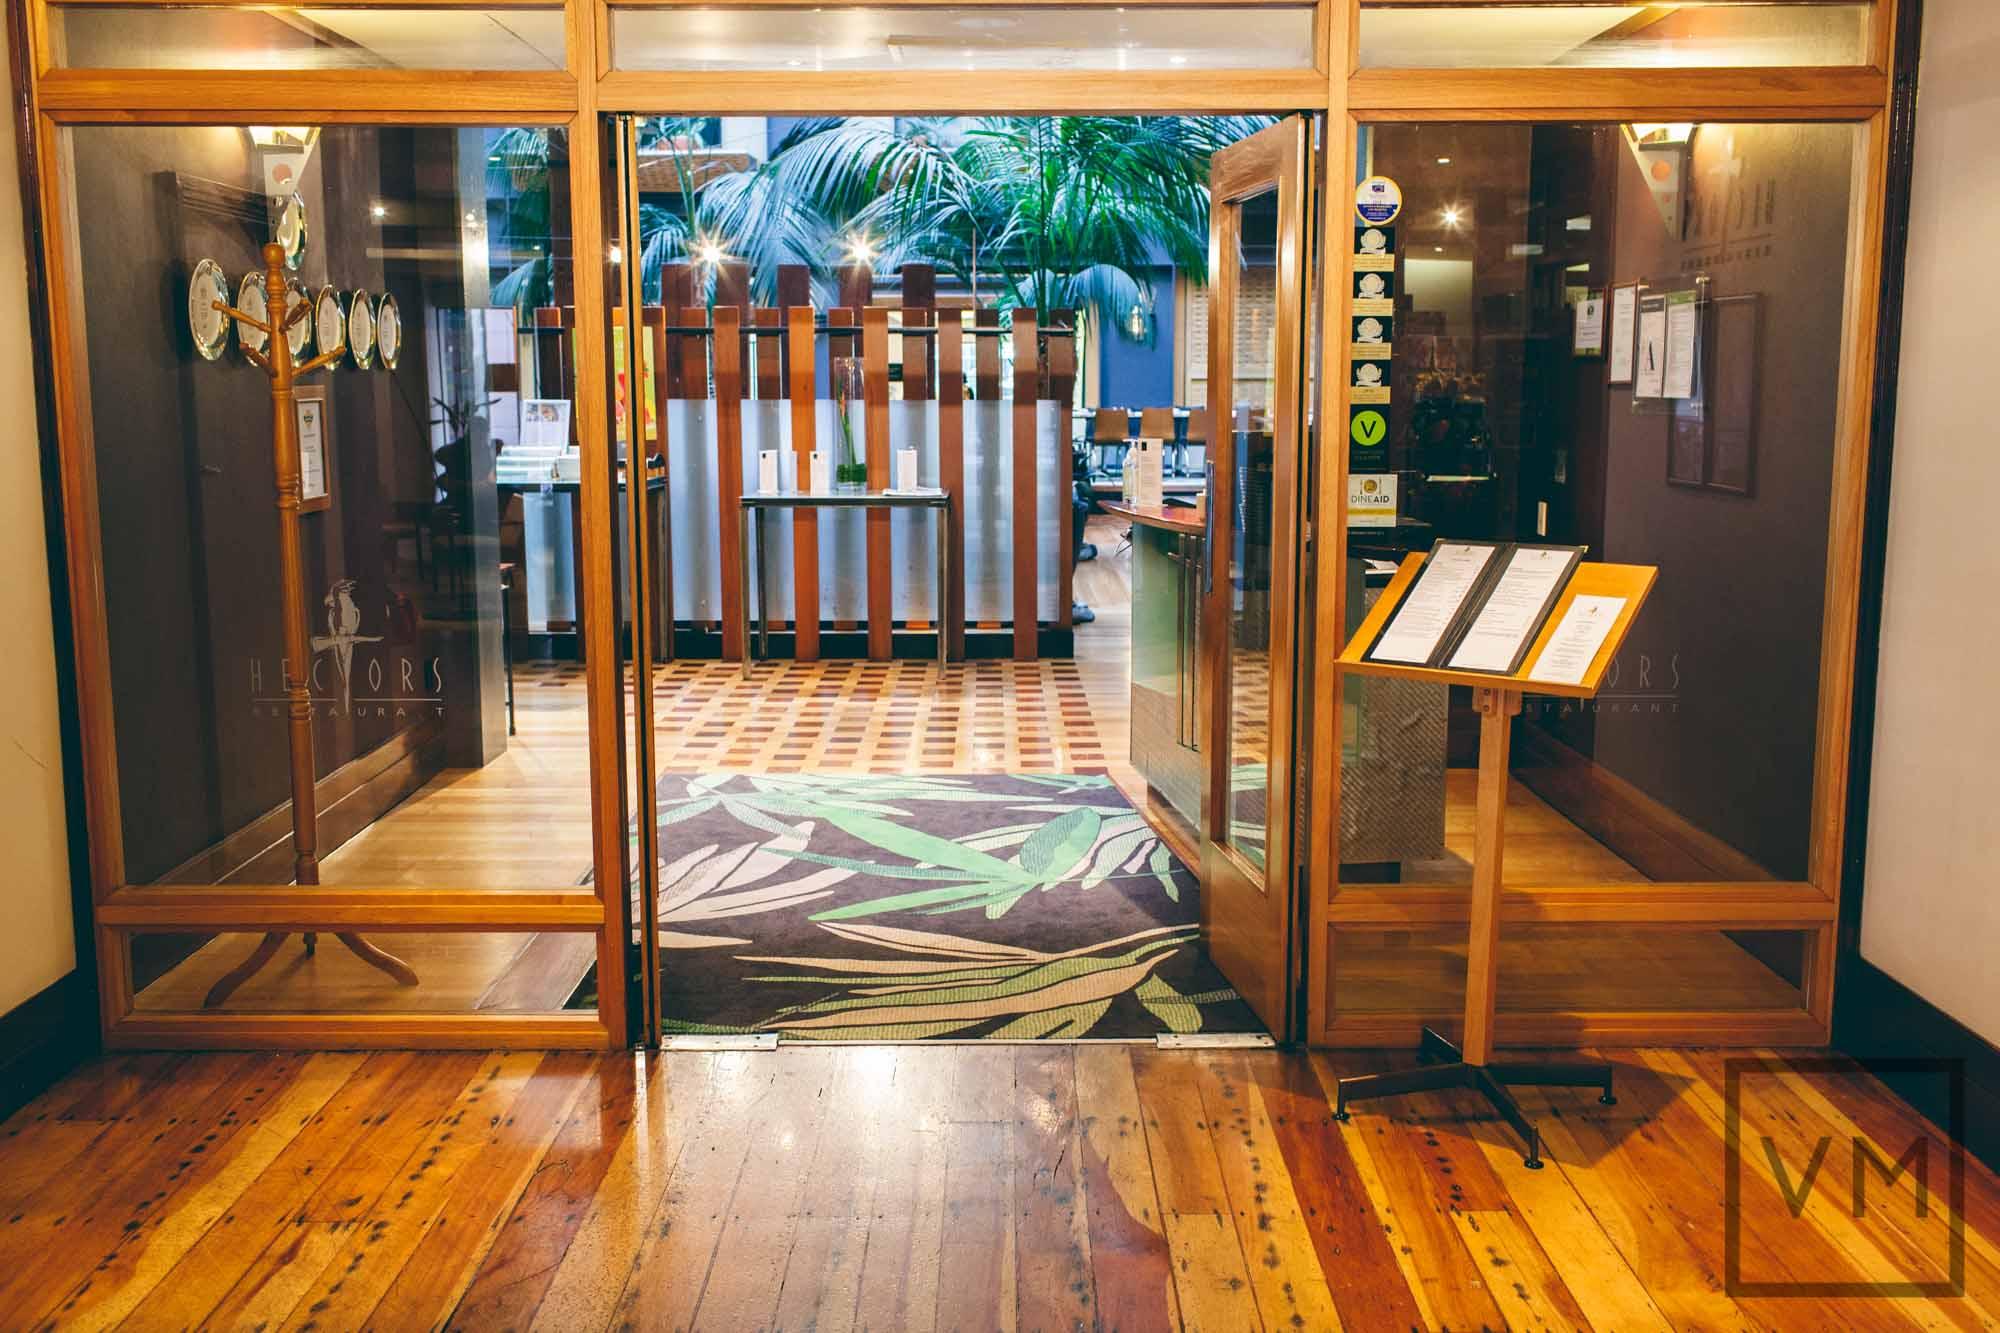 Hectors Restaurant Entrance